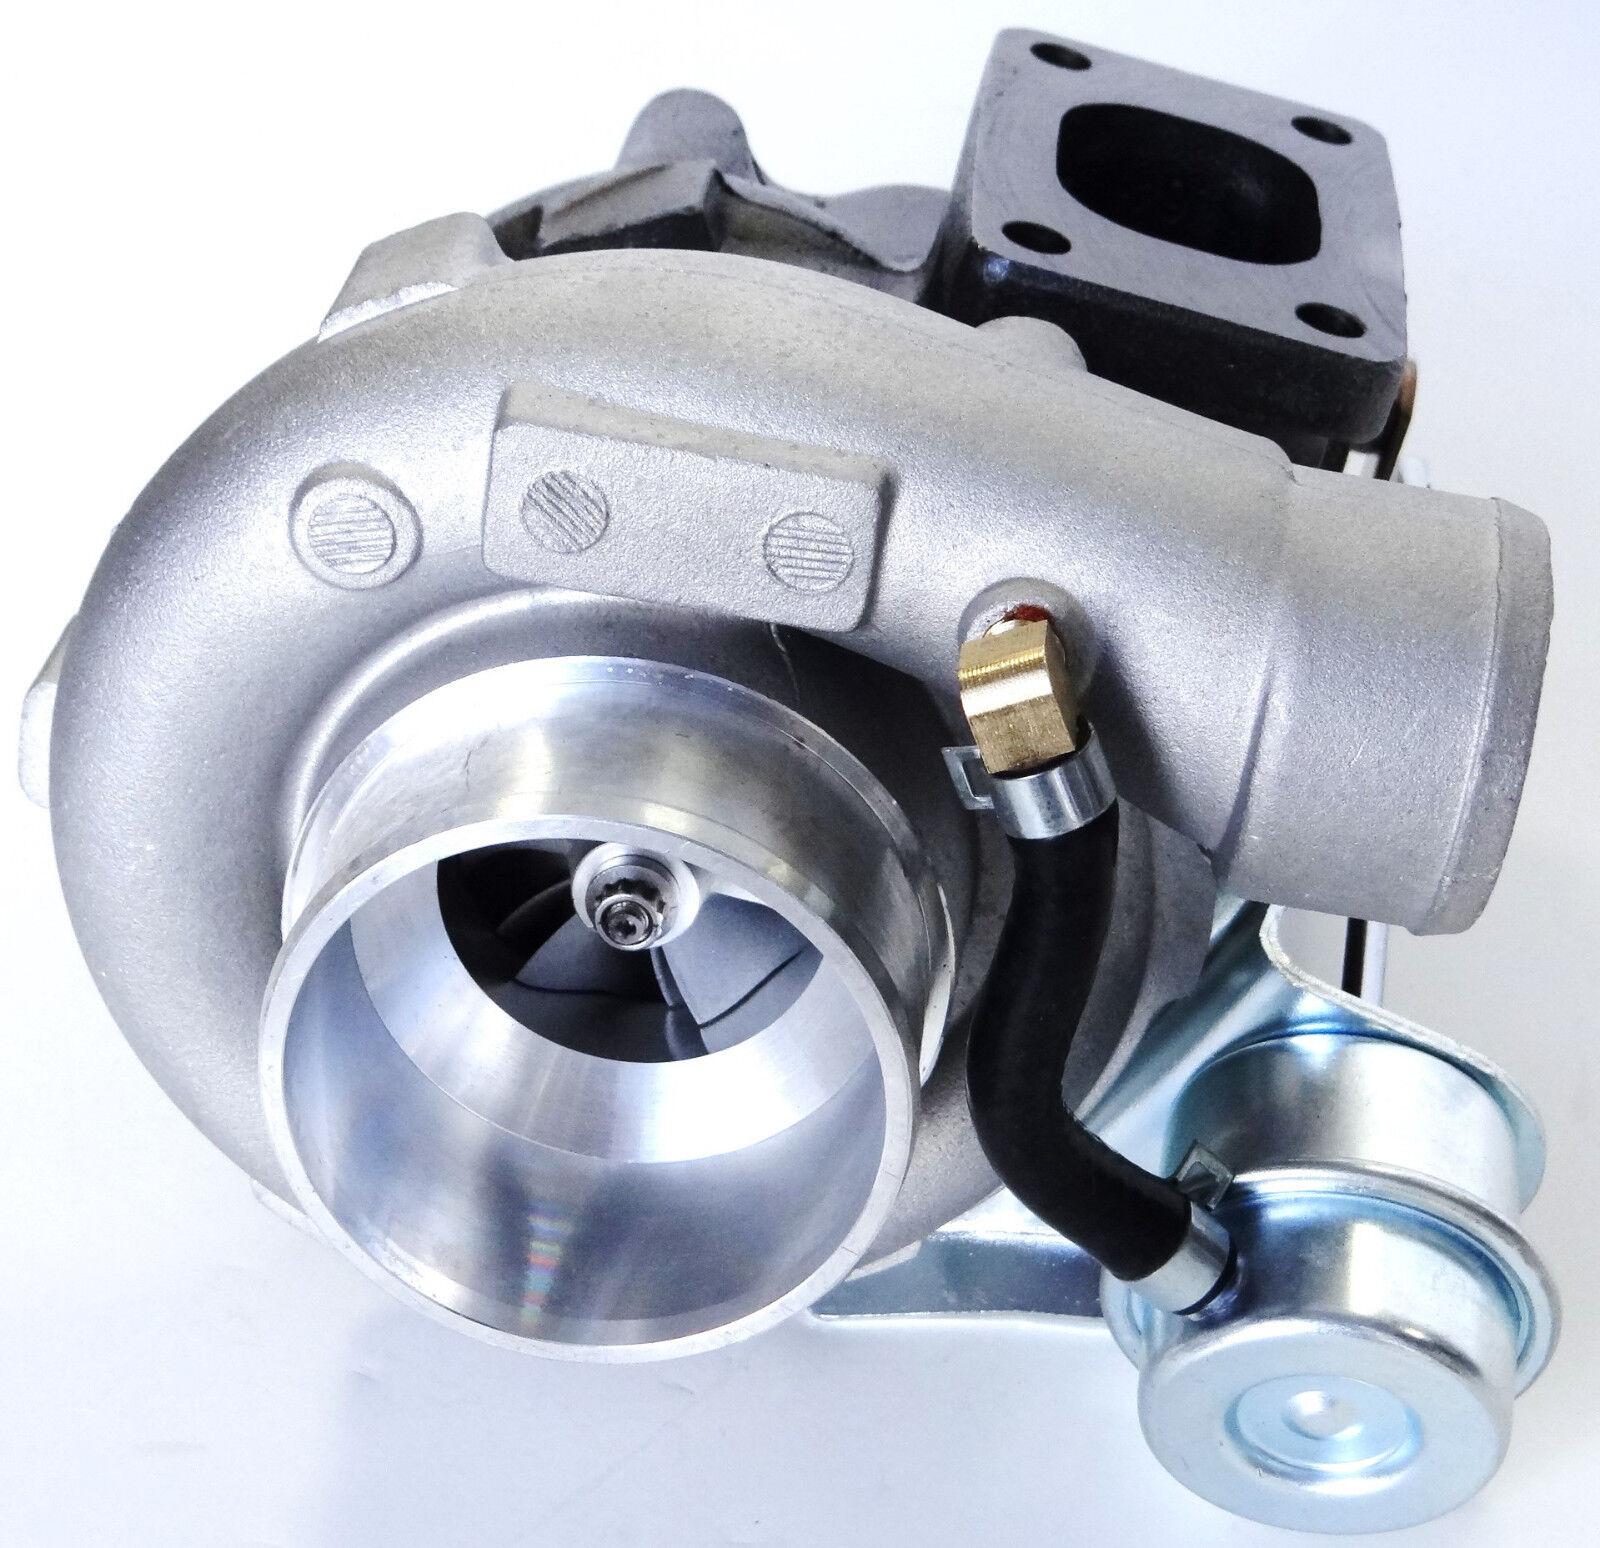 Used Turbo Ebay: GT25 GT28 T25 T28 GT2871 SR20 CA18DET Turbo Turbocharger